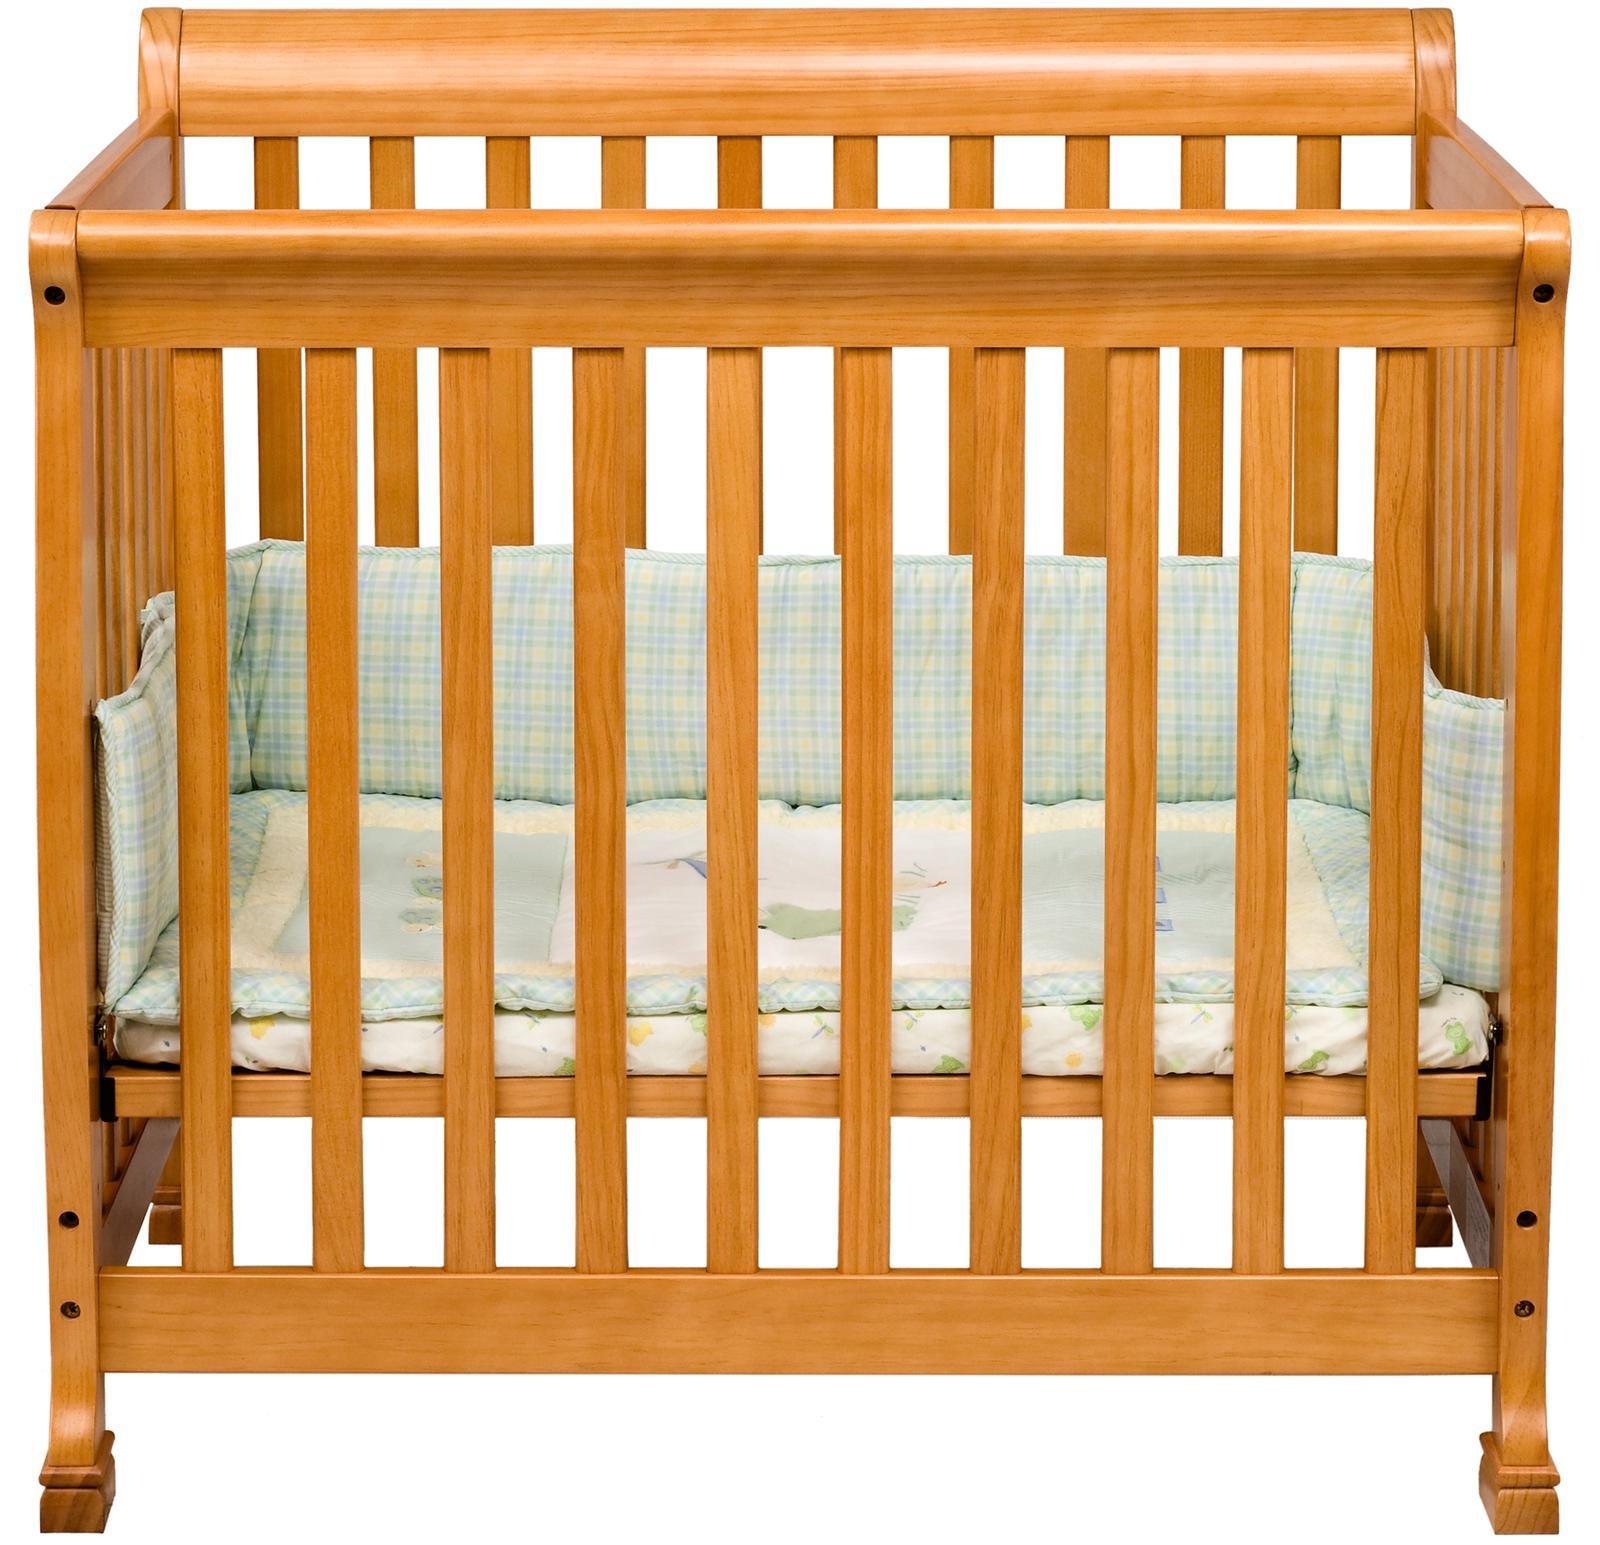 Davinci Kalani 4 in 1 | Davinci Kalani Dresser | Davinci Nursery Furniture Sets